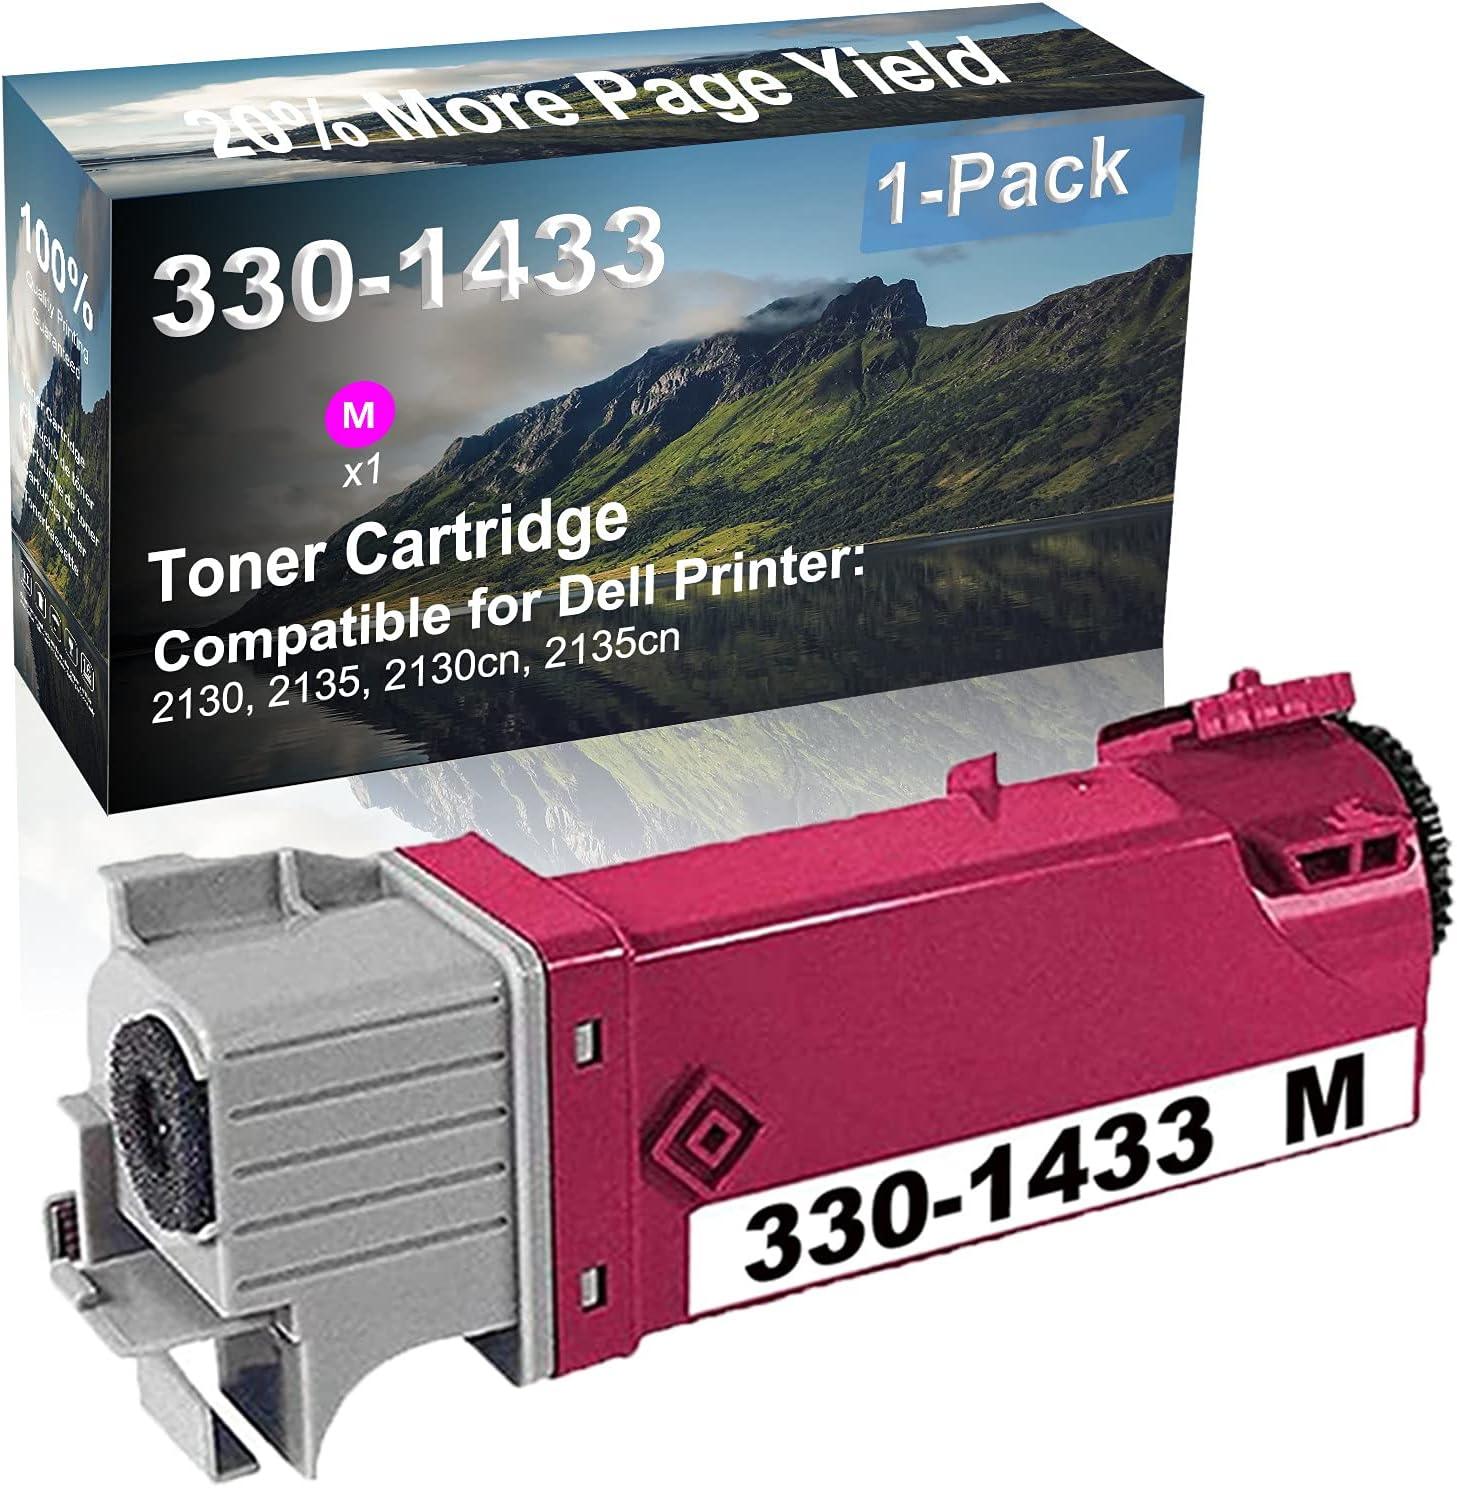 1-Pack (Magenta) Compatible 2130, 2135, 2130cn, 2135cn Printer Toner Cartridge High Capacity Replacement for Dell 330-1433 Toner Cartridge